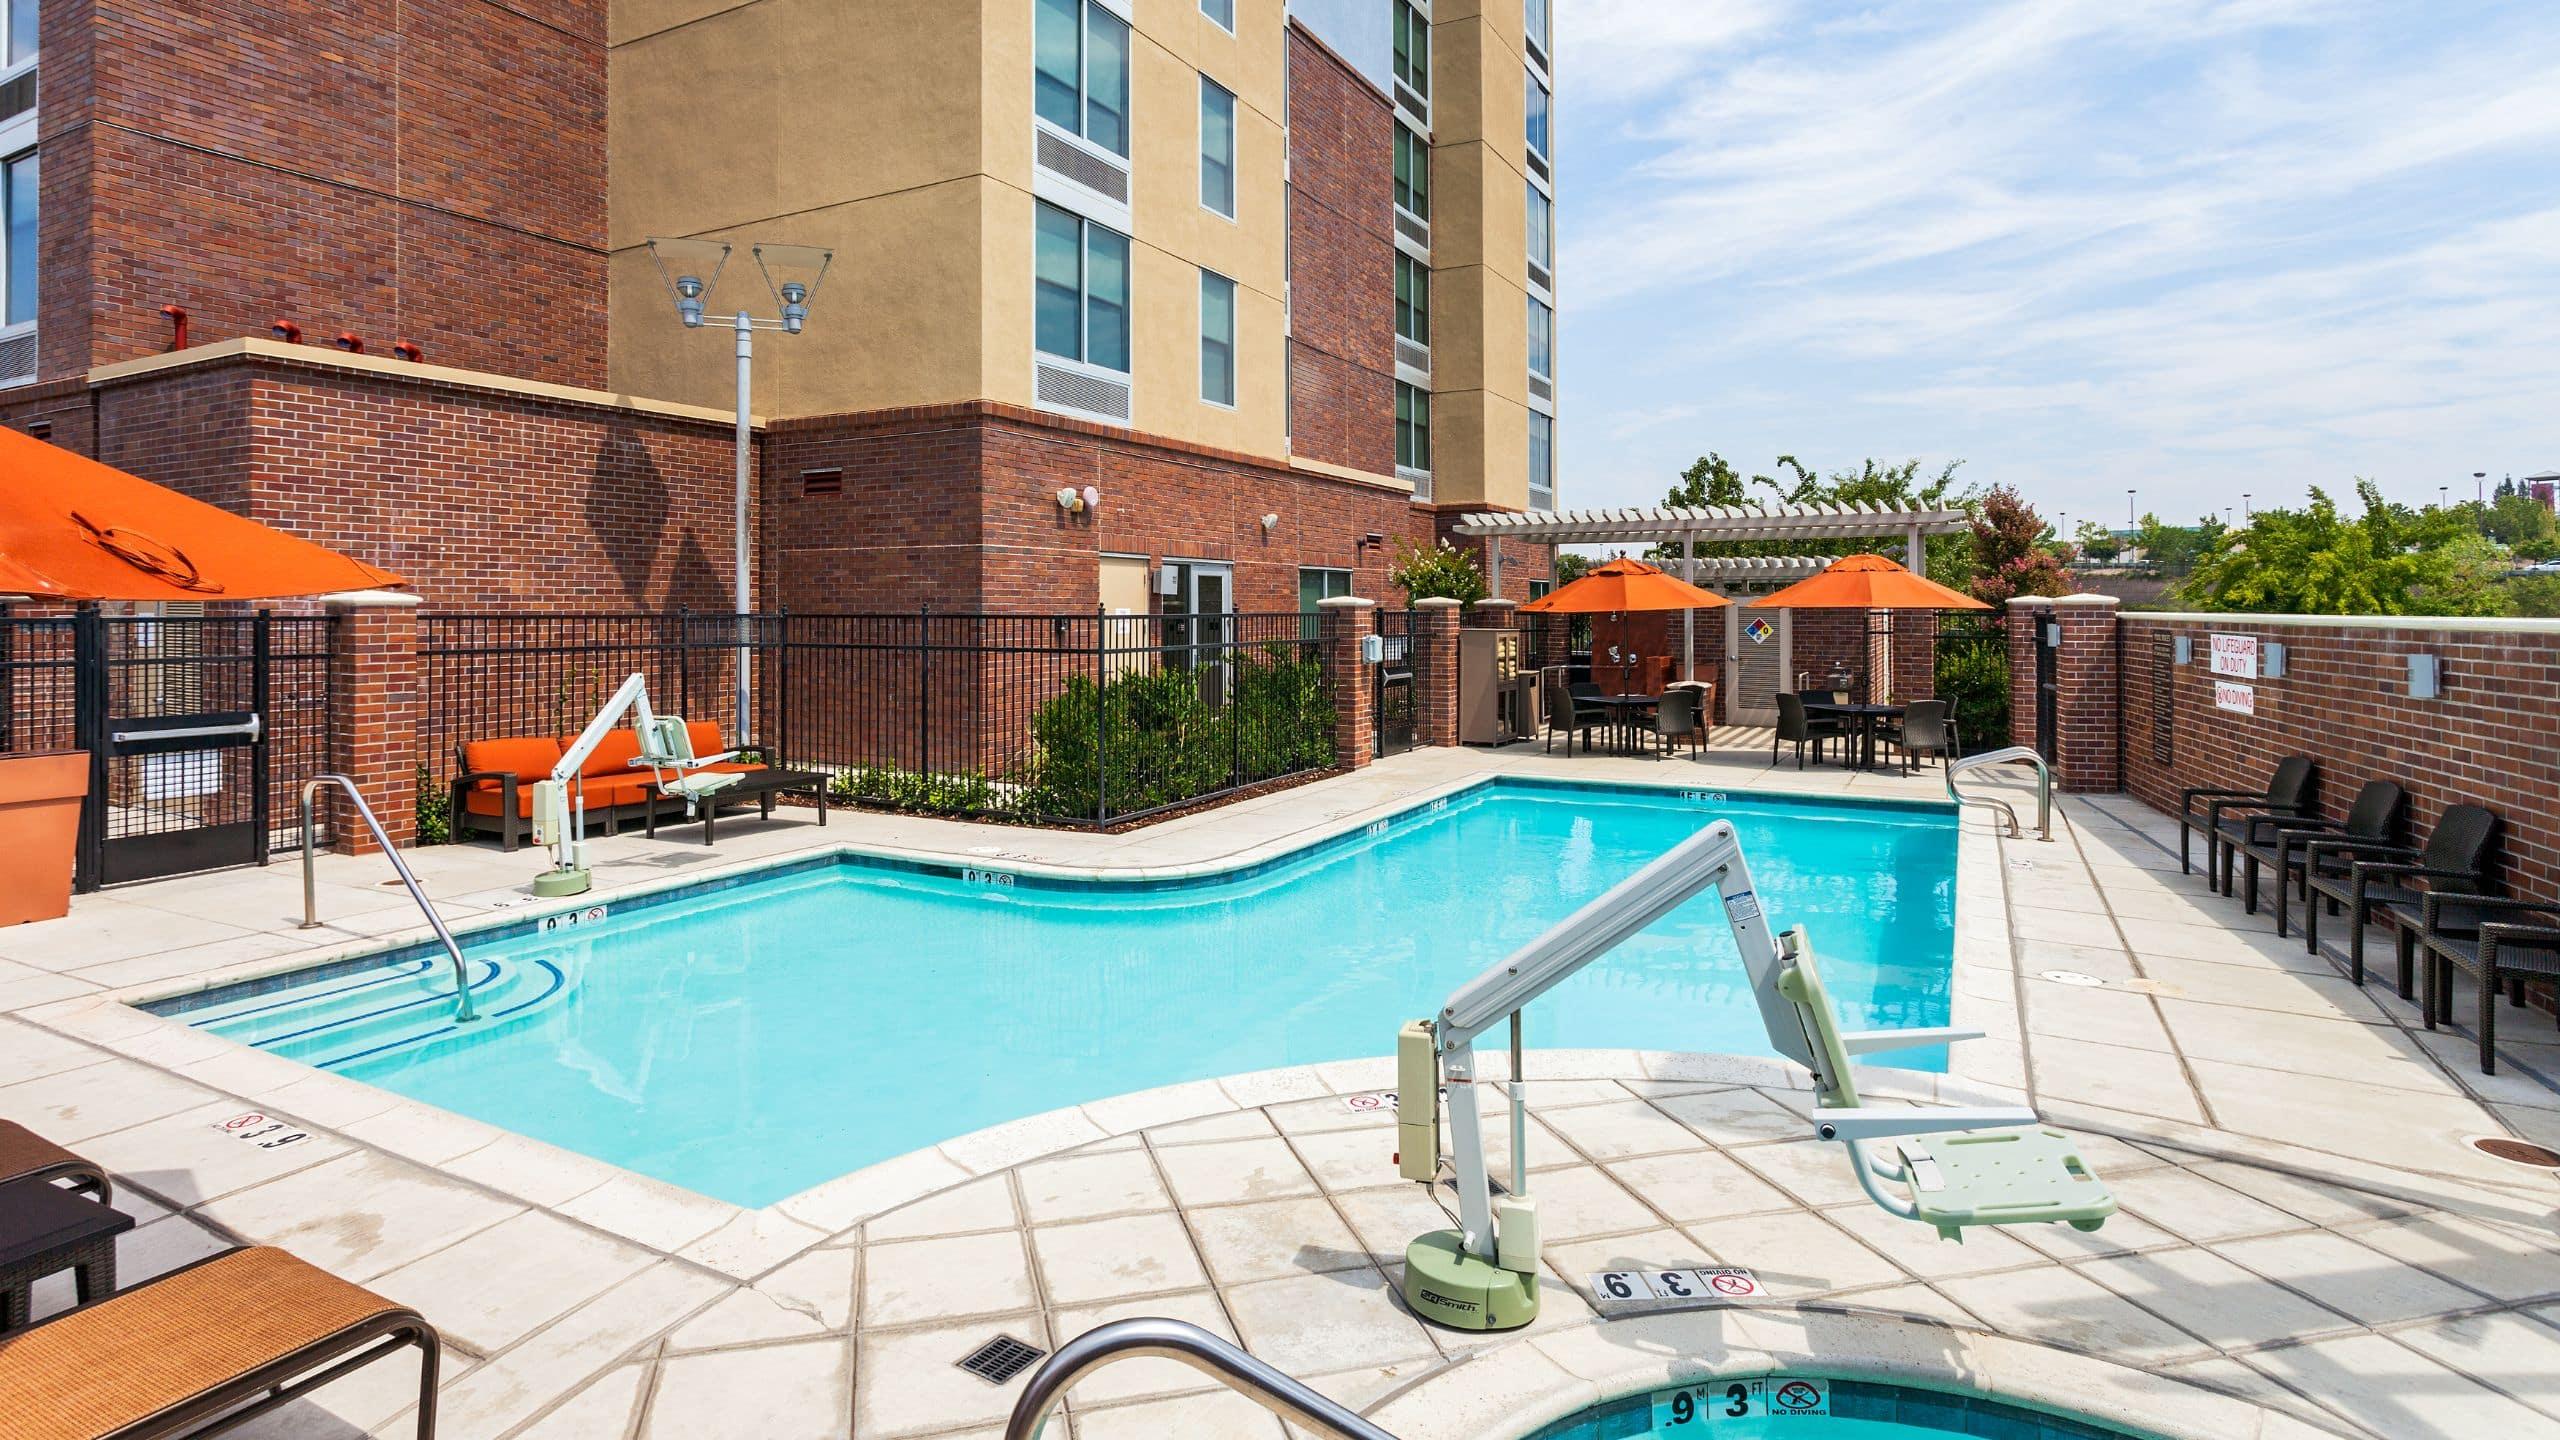 Best Hotel Near Westfield Galleria In Roseville Ca Hyatt Place Sacramento